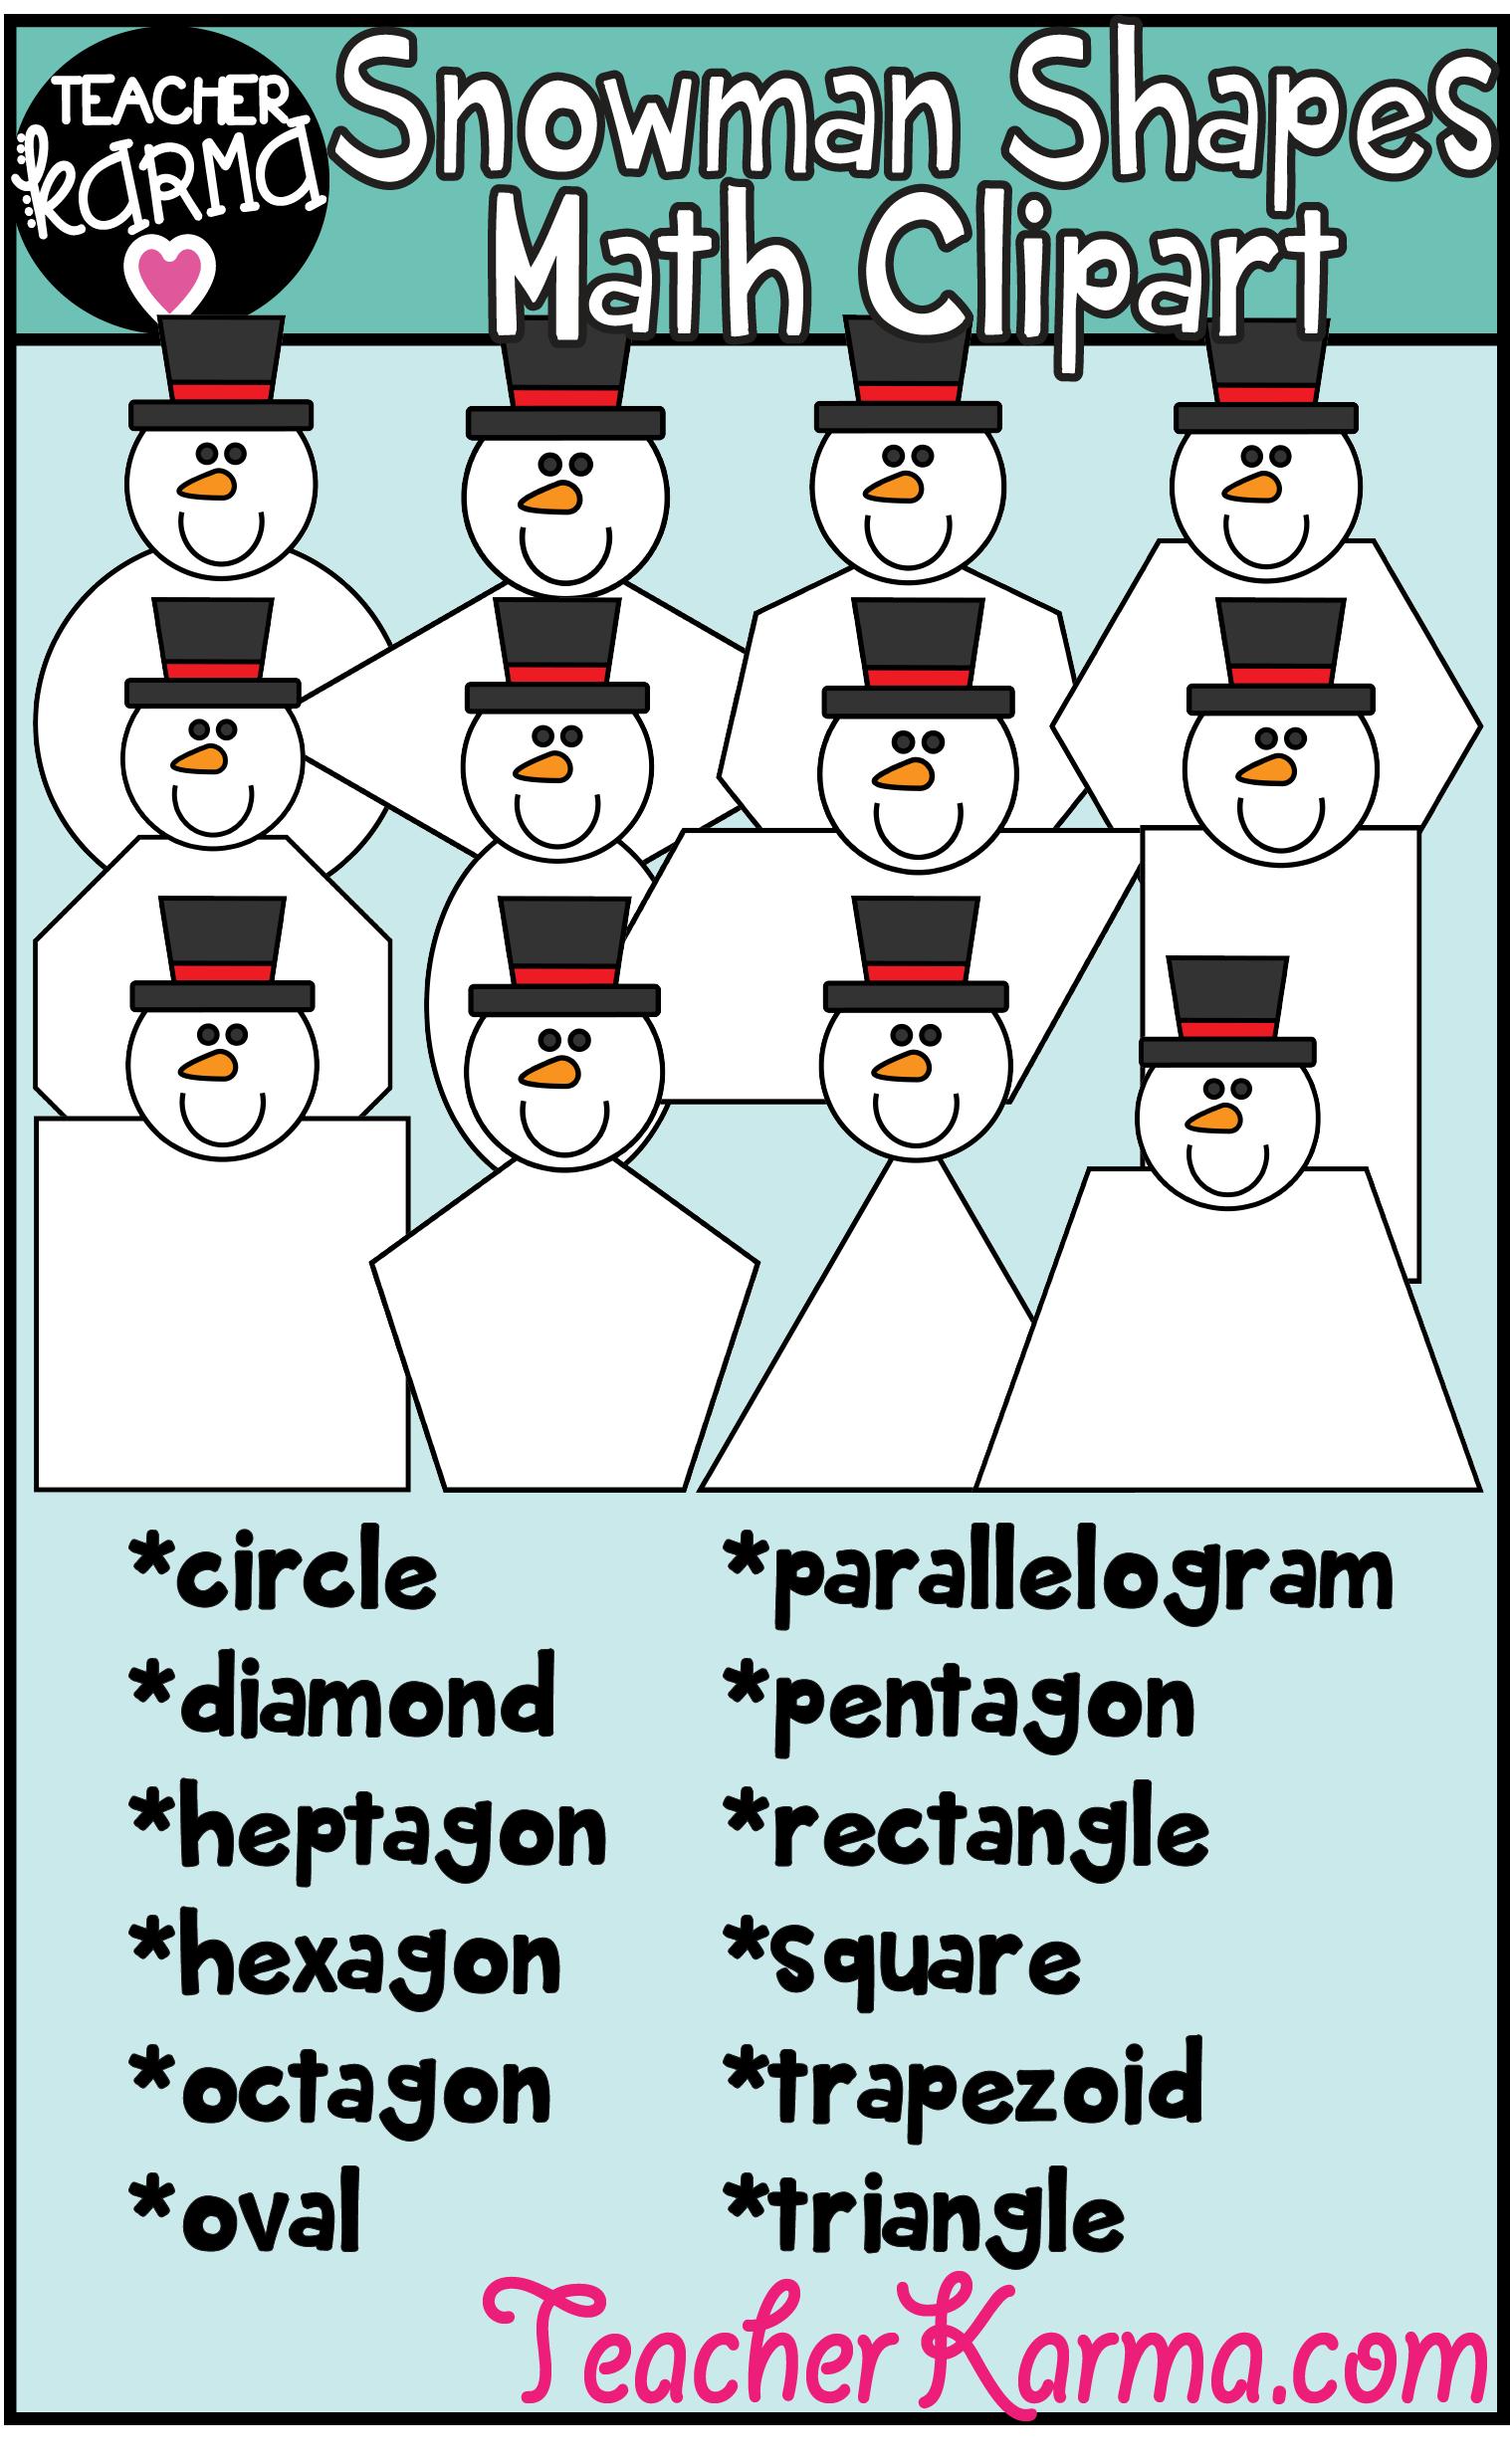 Snowman Shapes Clipart Christmas